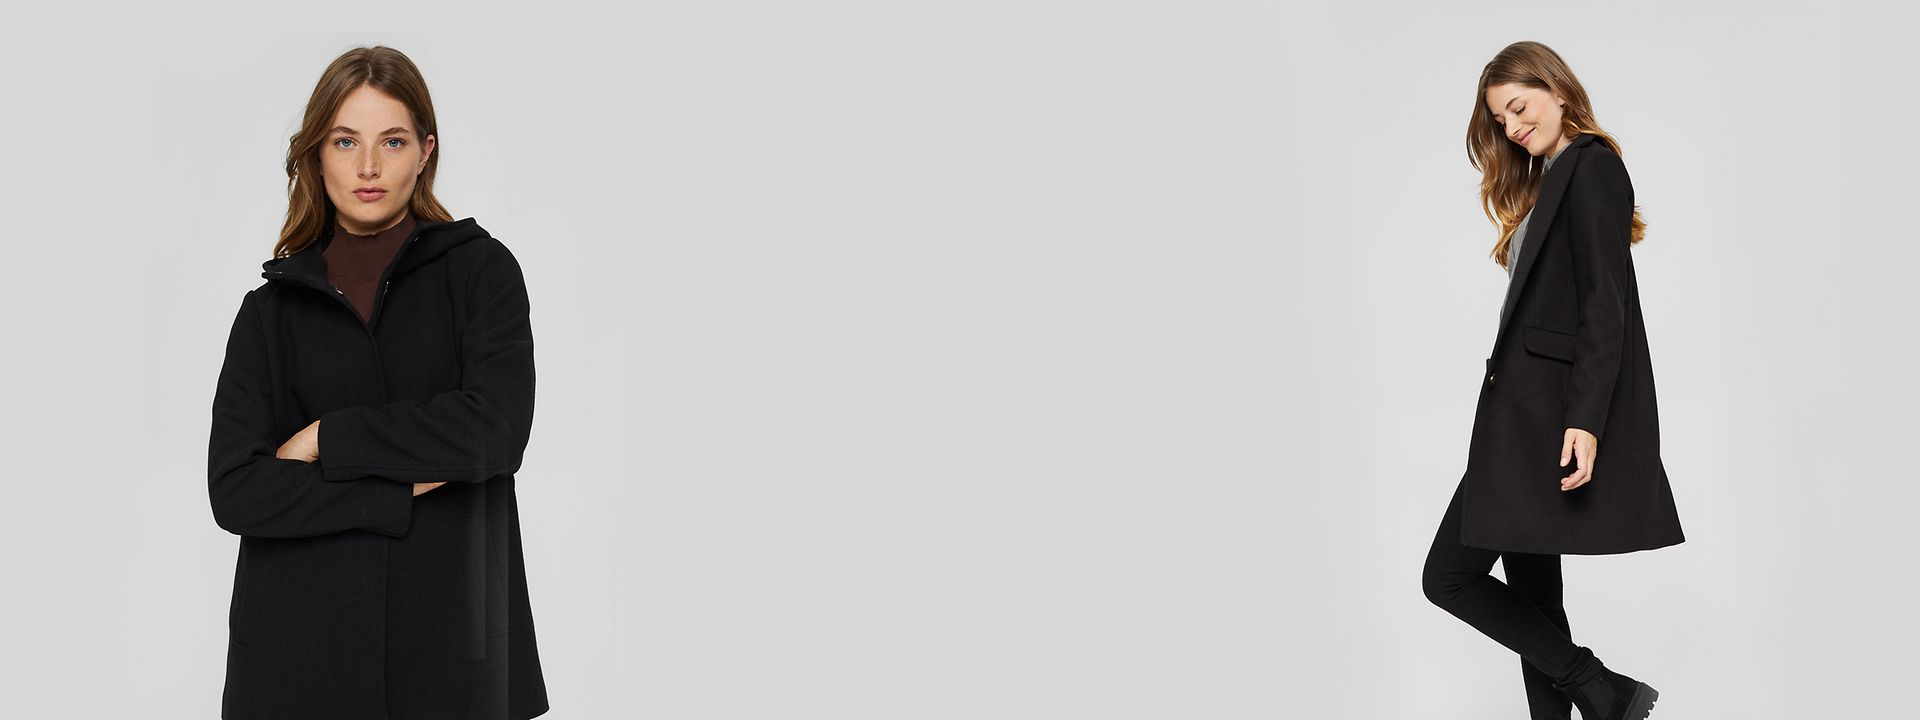 072021 - women - startpage - main banner - outerwear - img